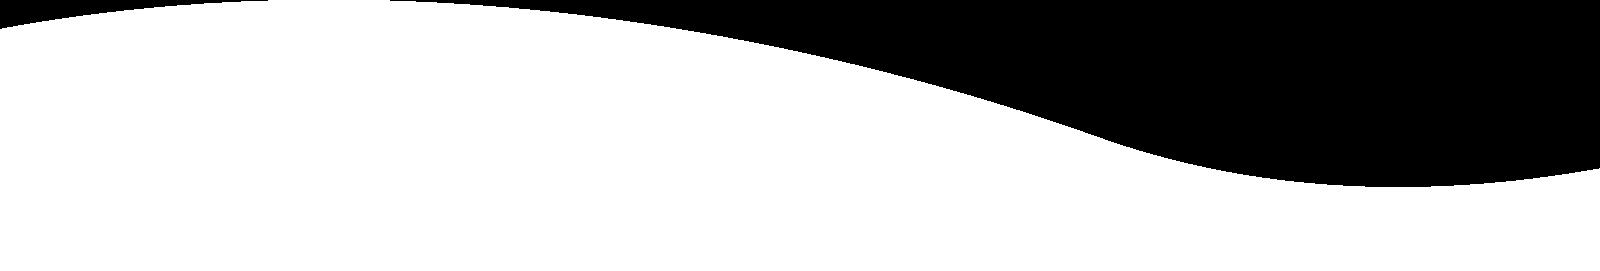 Princing background image